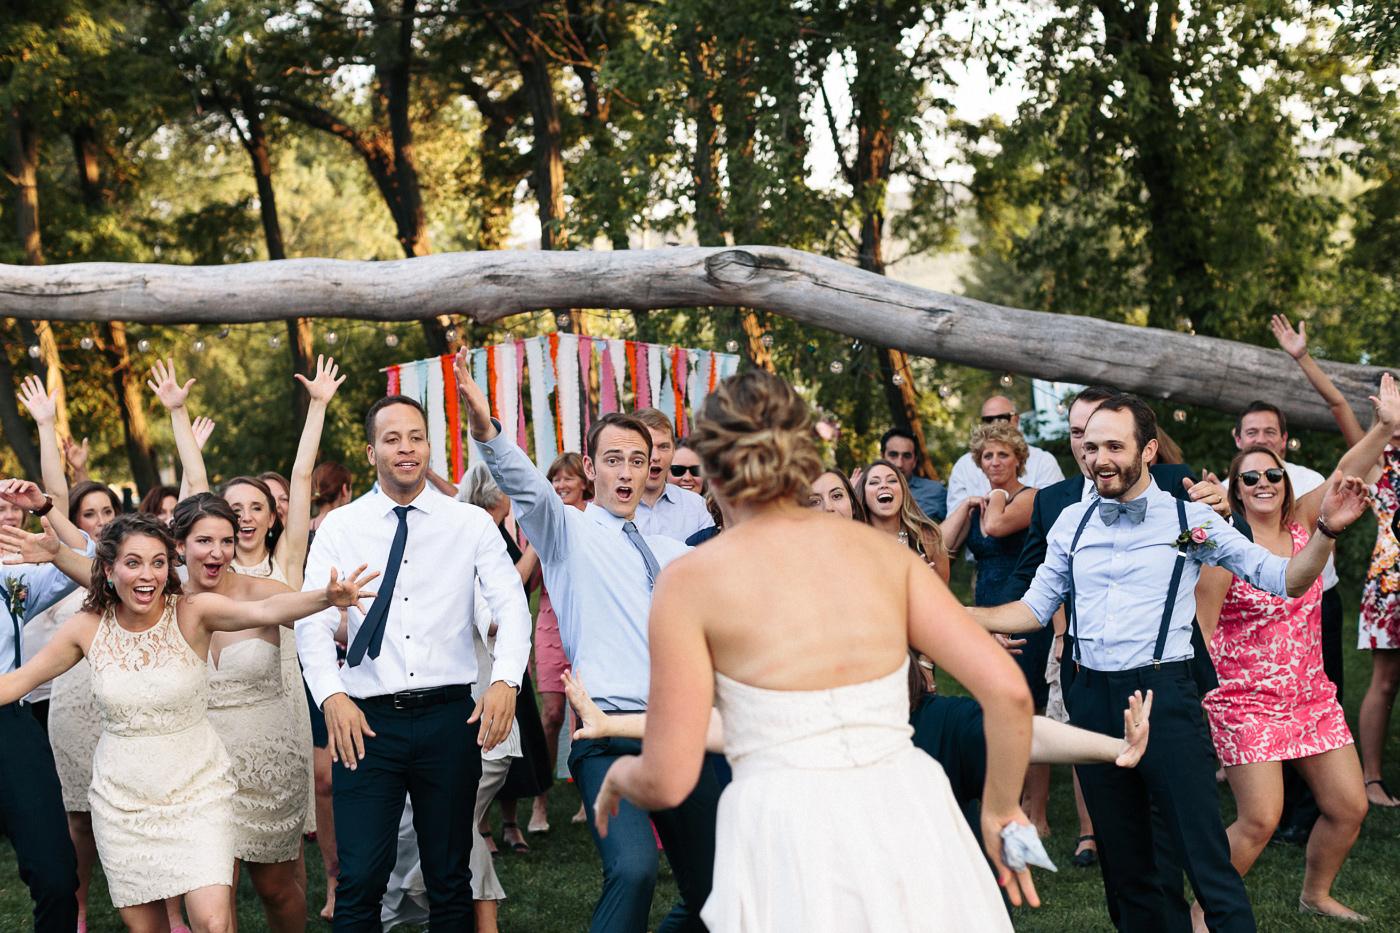 Lyons-Farmette-Wedding-Photographer-Lucy-Austin-Flash-Mob-Dance-53.jpg